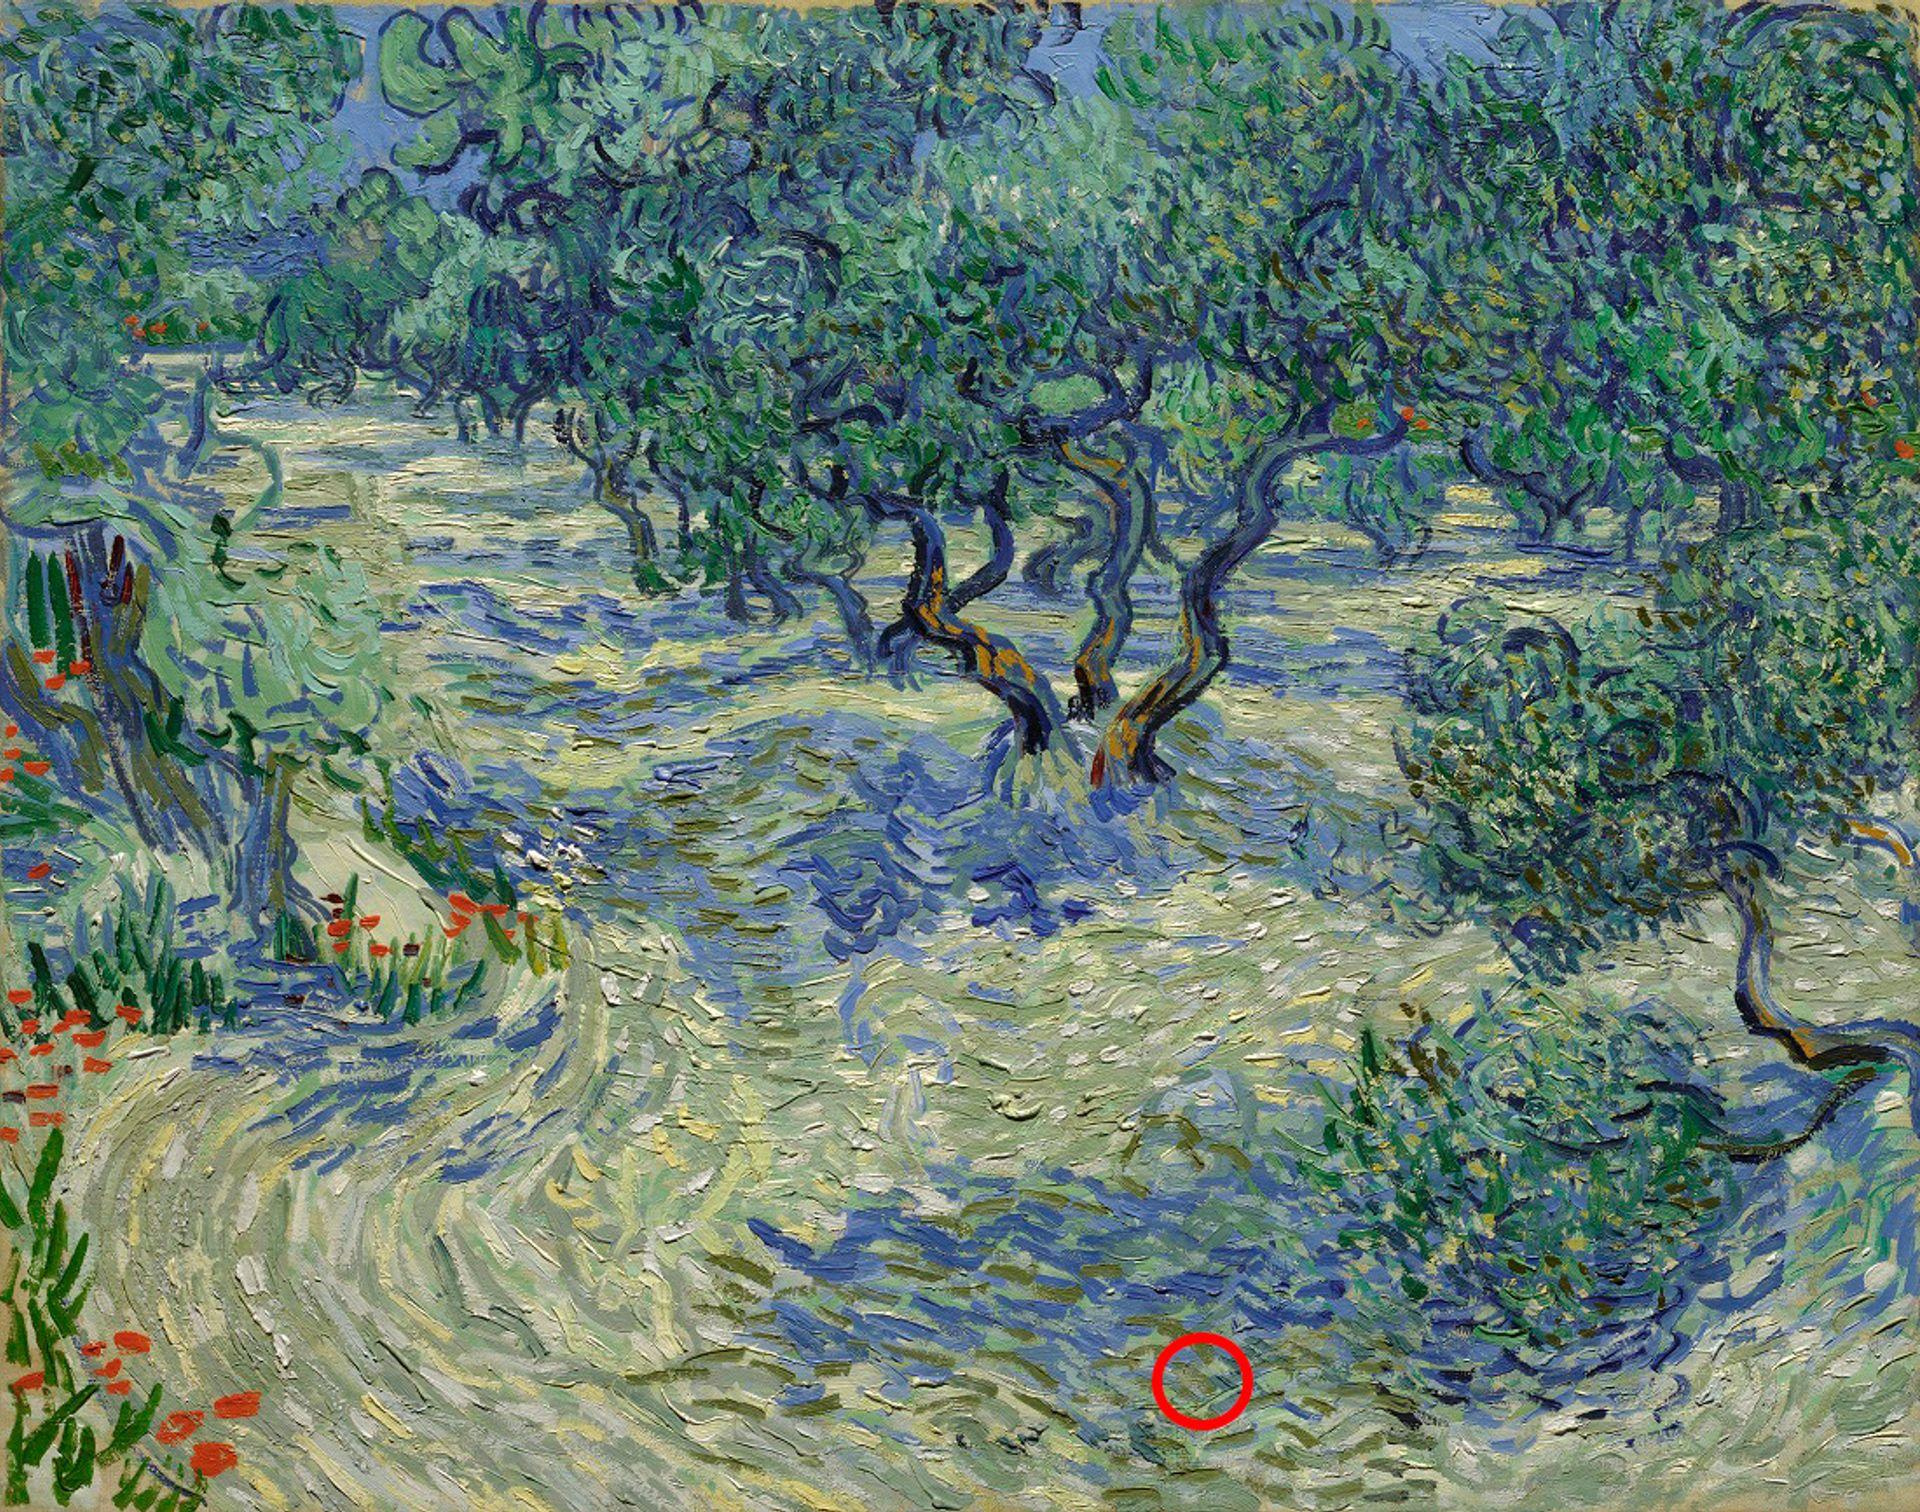 Vincent van Gogh's Olive Trees (June-September 1889) Courtesy of the Nelson-Atkins Museum of Art, Kansas City, Missouri